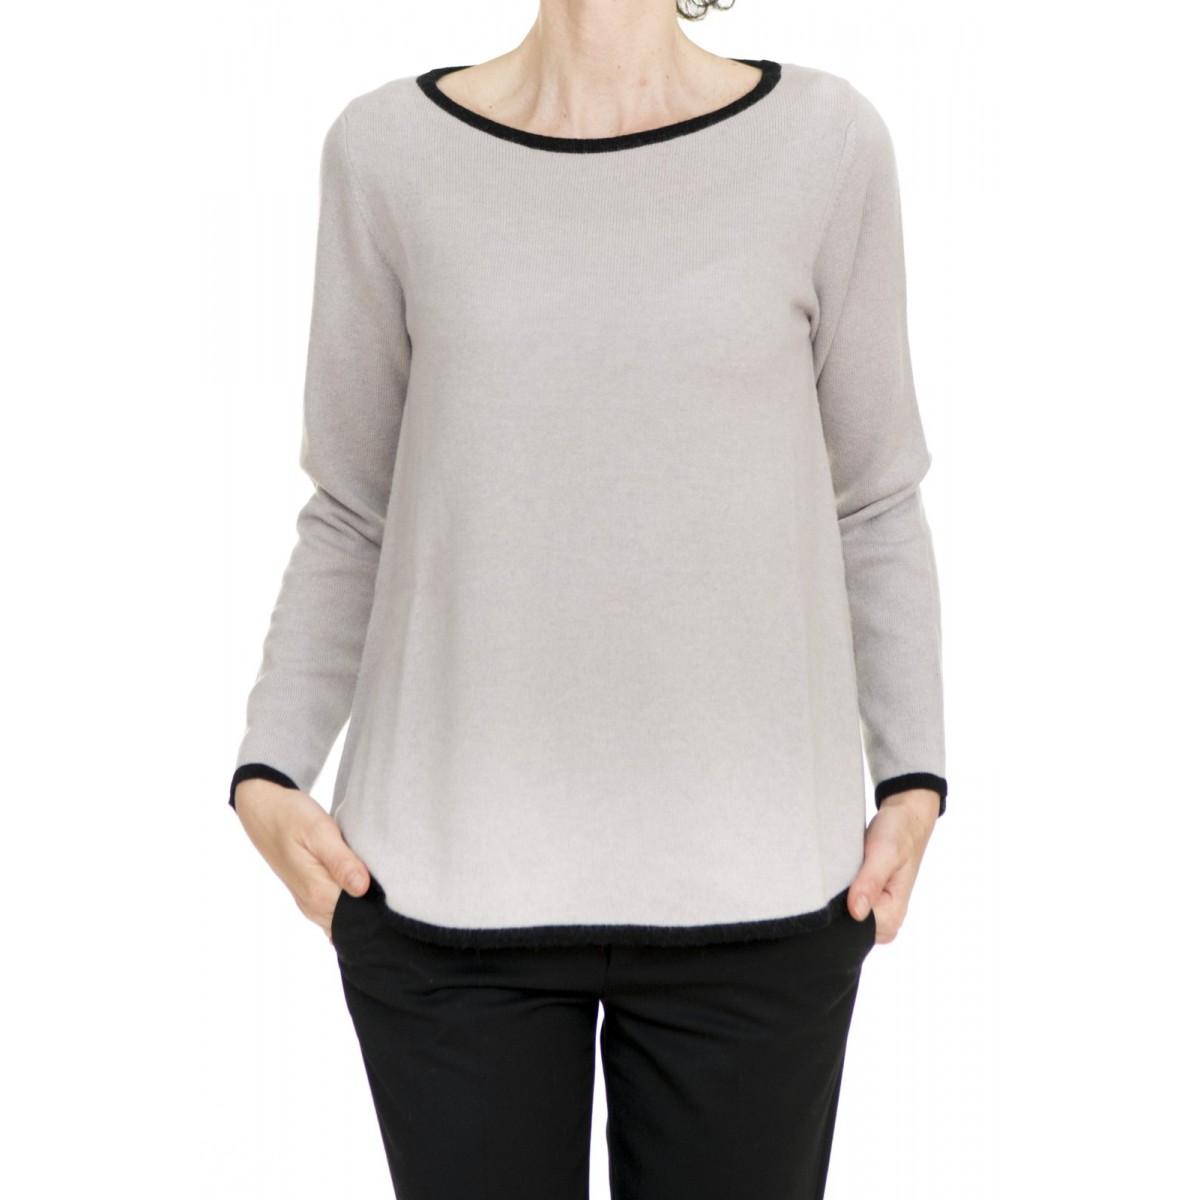 Maglia donna Kangra - 2520/13 maglia bordo contrasto